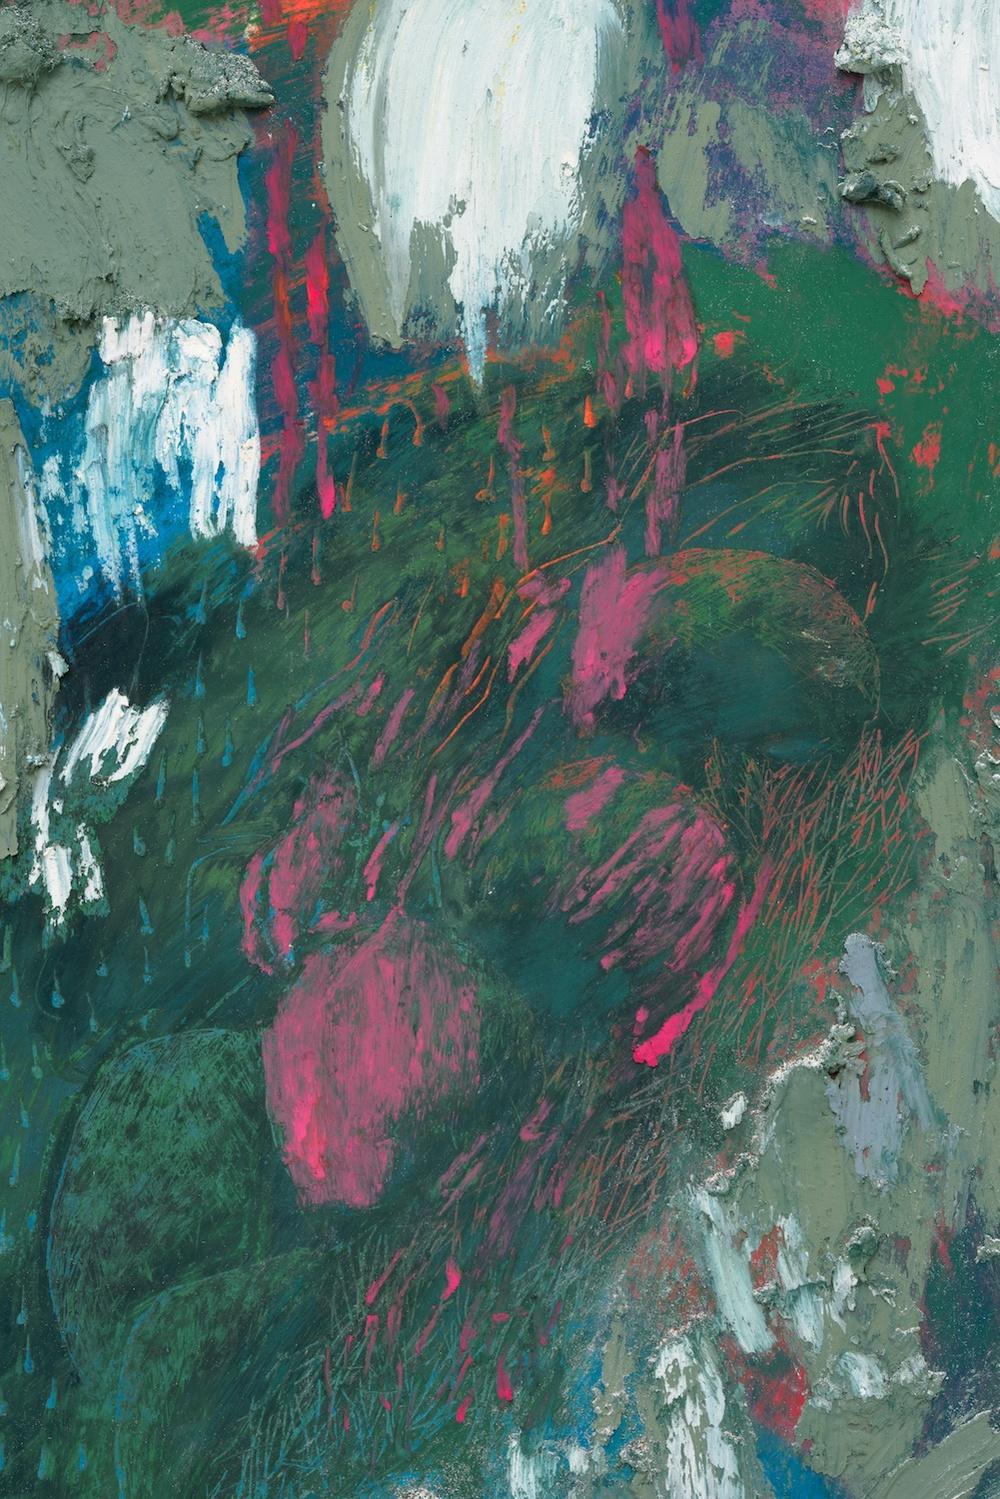 Mimi Lauter  The Goose  (Detail) 2015 Soft pastel, oil pastel on paper 83 ⅜h x 65w in (artwork); 88h x 69 ⅝w x 3d in (framed) MLaut044